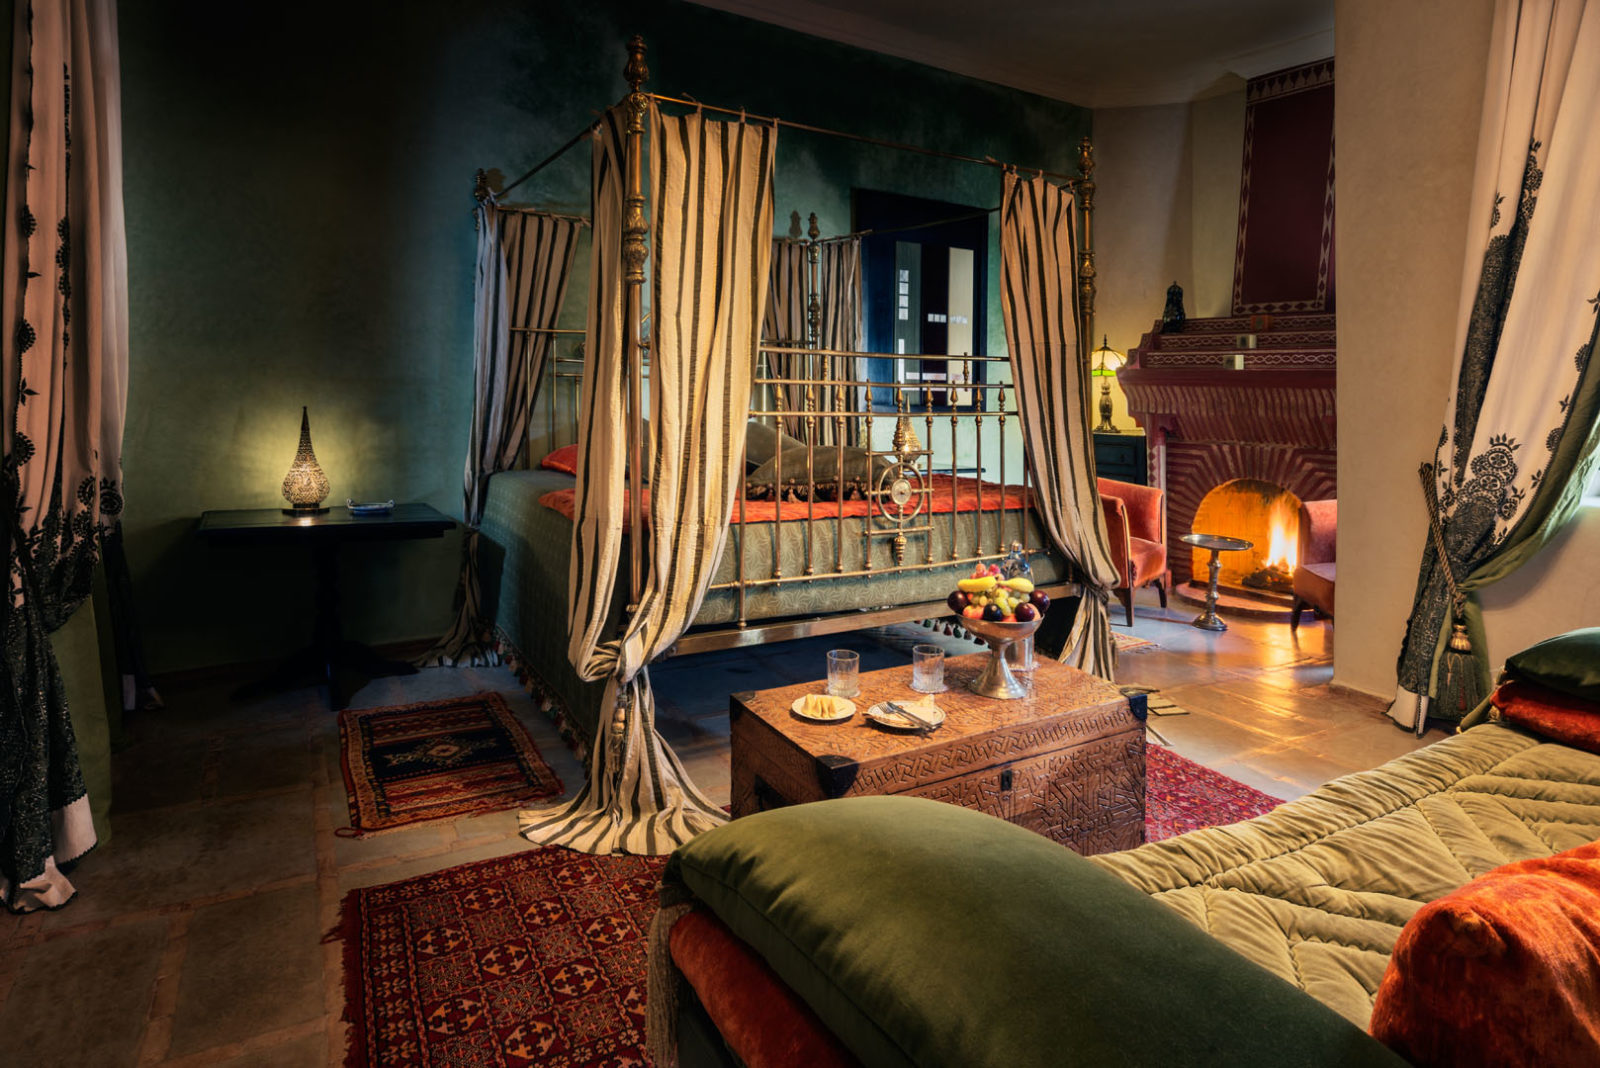 Classic Suites Marrakech Morocco Riad Kheirredine 5 Star